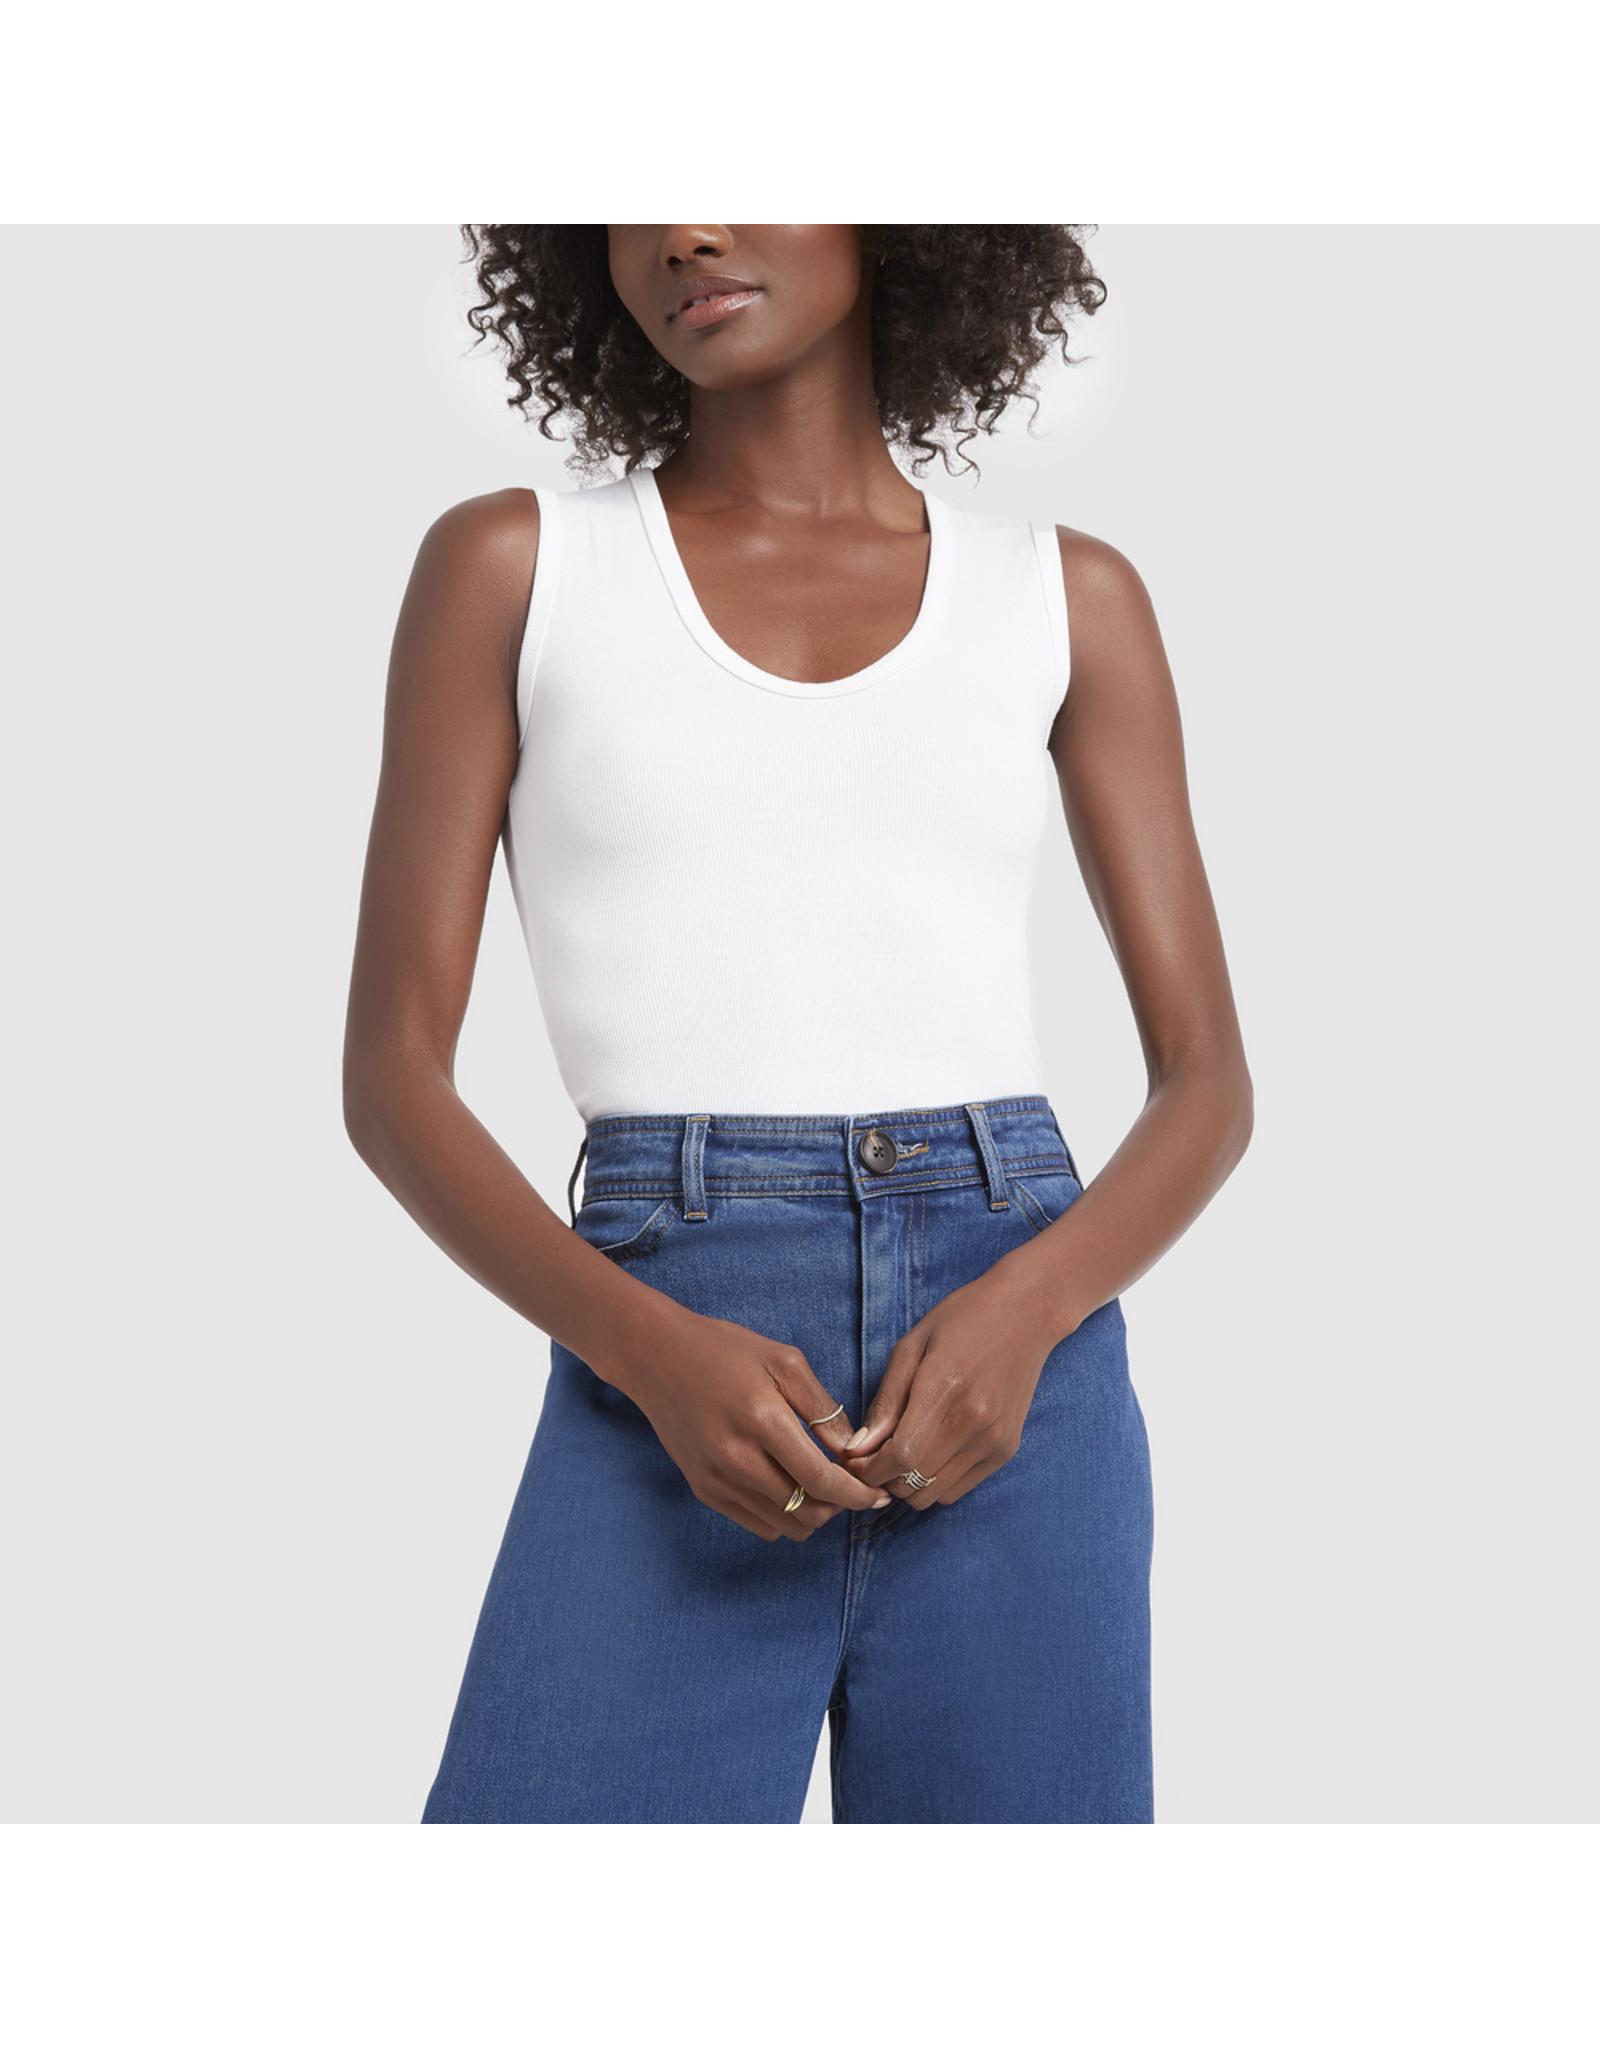 G. Label G. Label Amanda Bodysuit Tall (Color: White, Size: M)